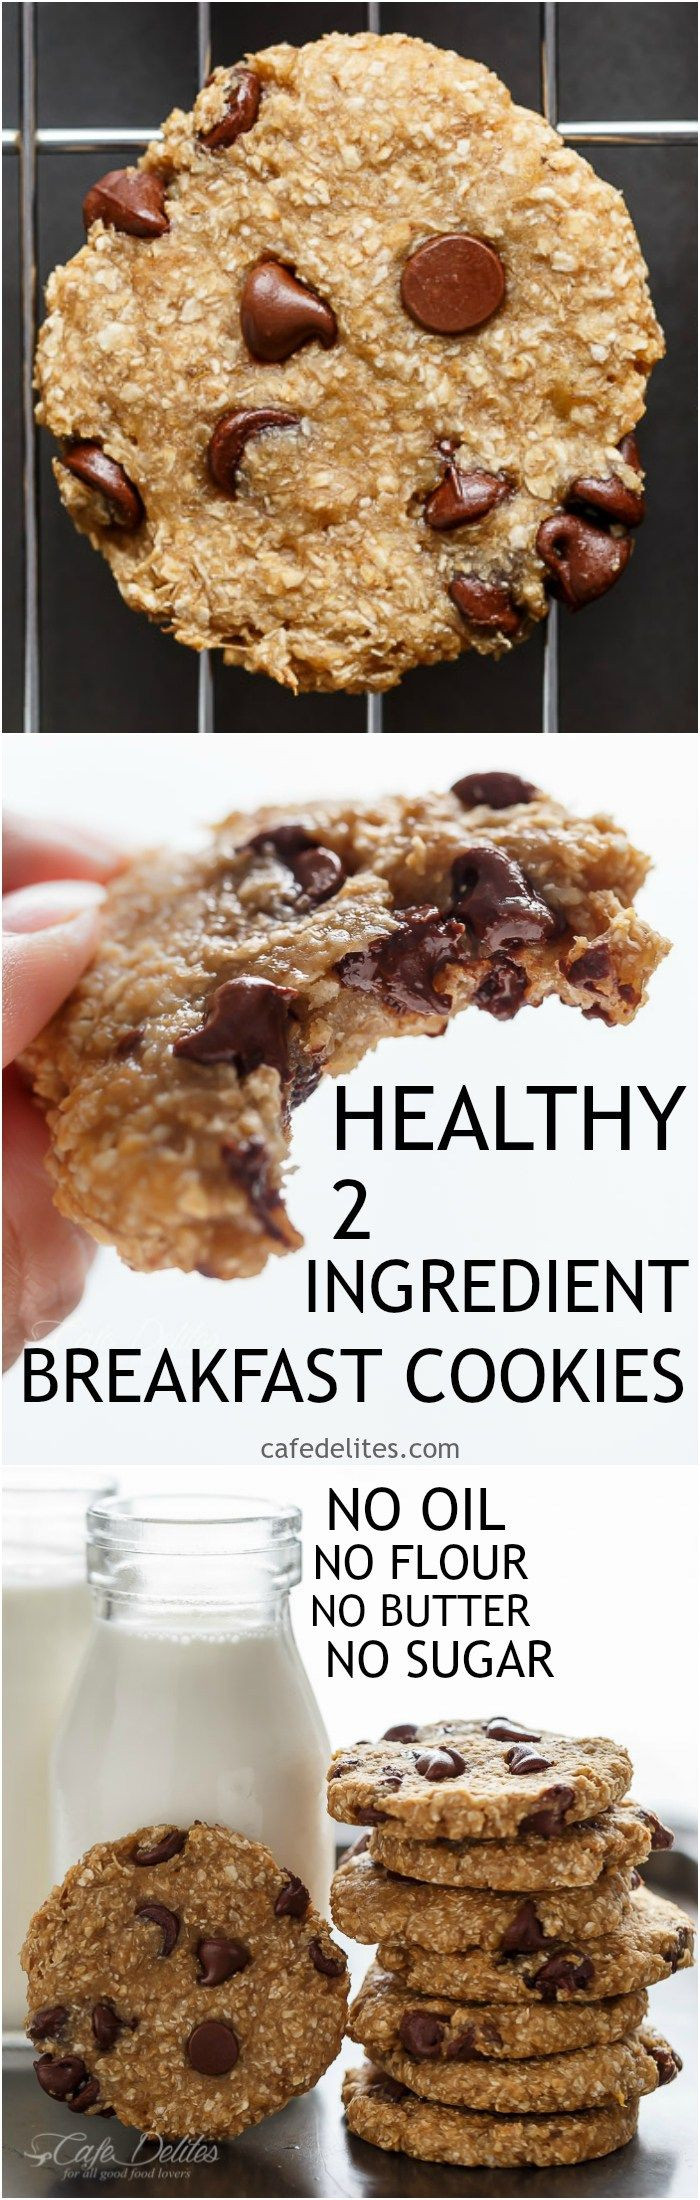 Low Calorie No Bake Cookies  Best 25 Low calorie breakfast ideas only on Pinterest